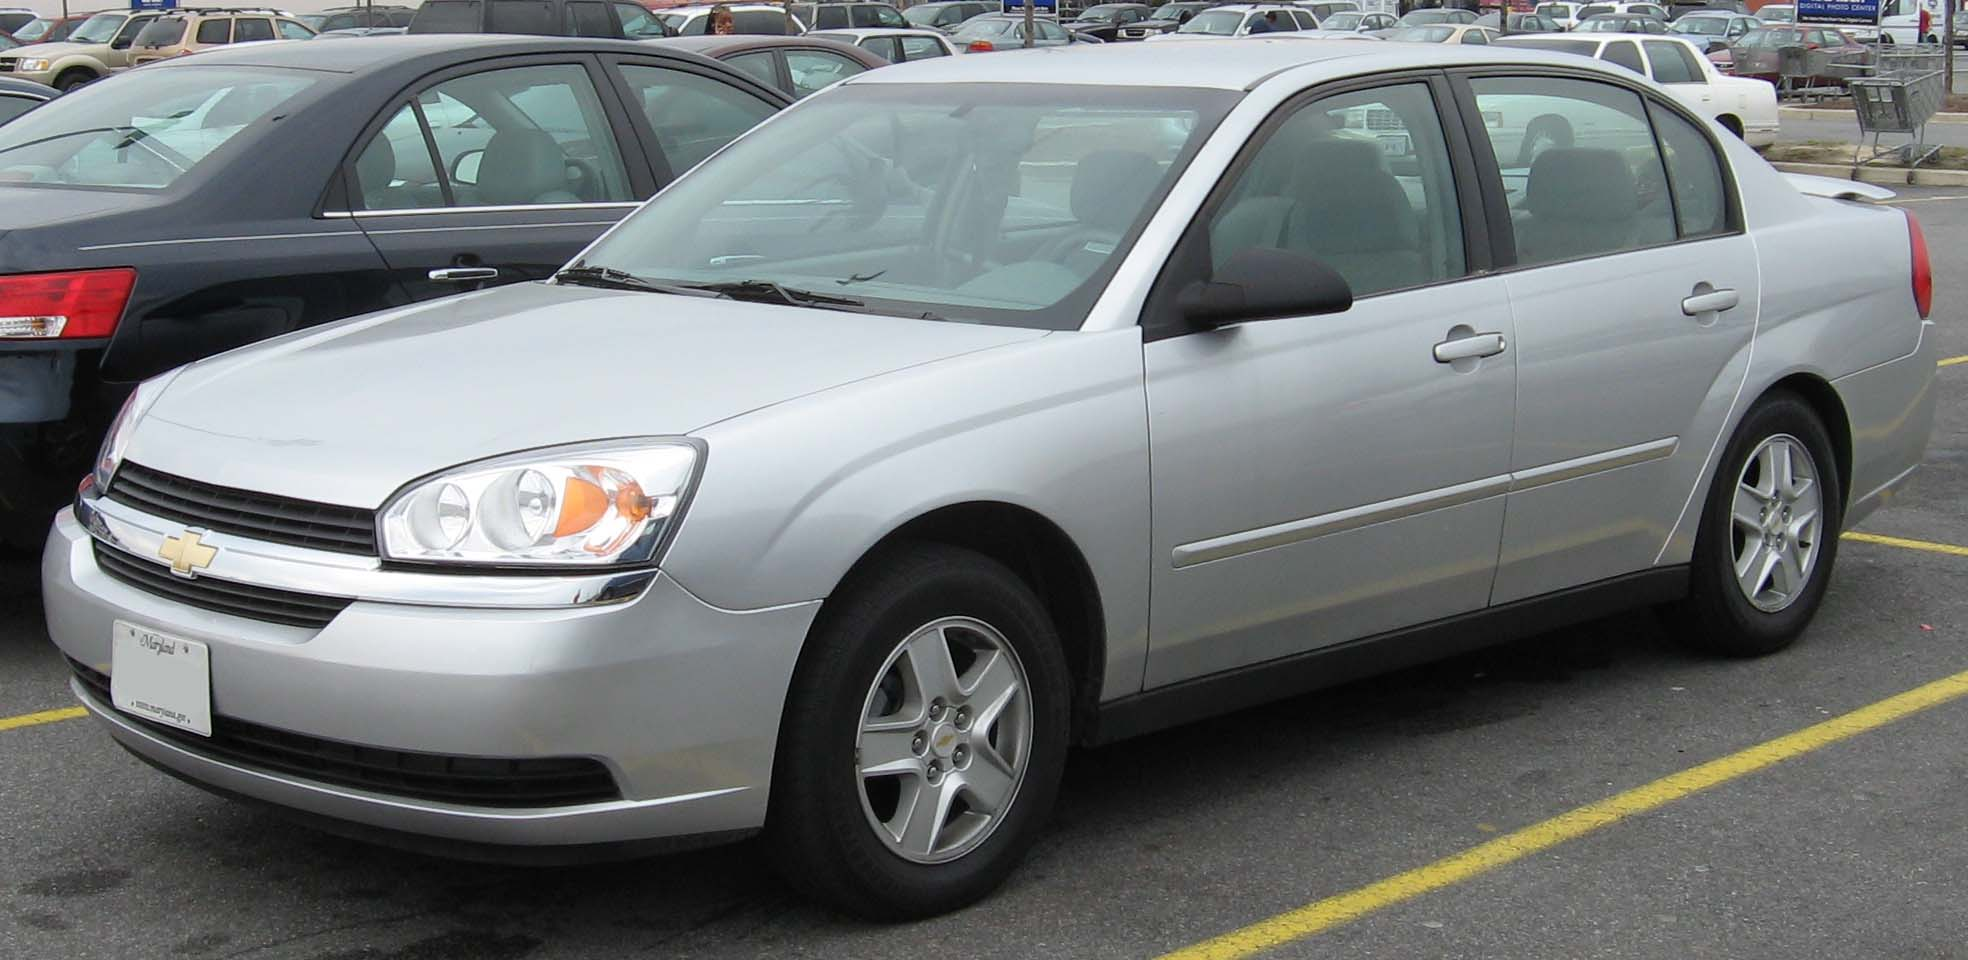 All Chevy chevy classic 2005 : File:2004-05 Chevrolet Malibu.jpg - Wikimedia Commons